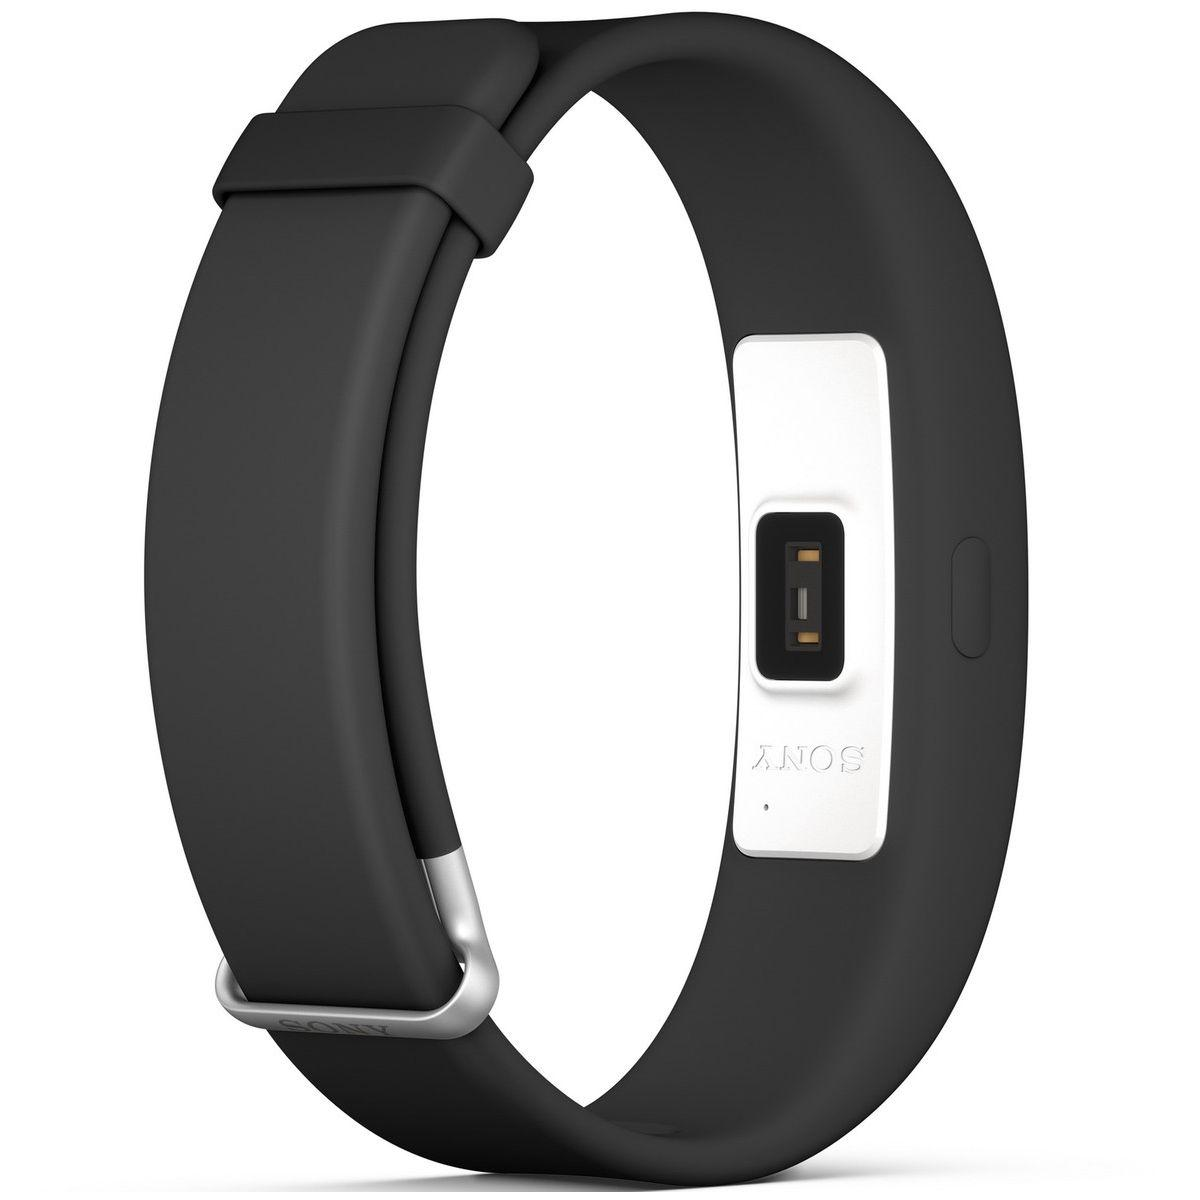 Montre sony smartband 2 noir - livraison offerte : code chronoff